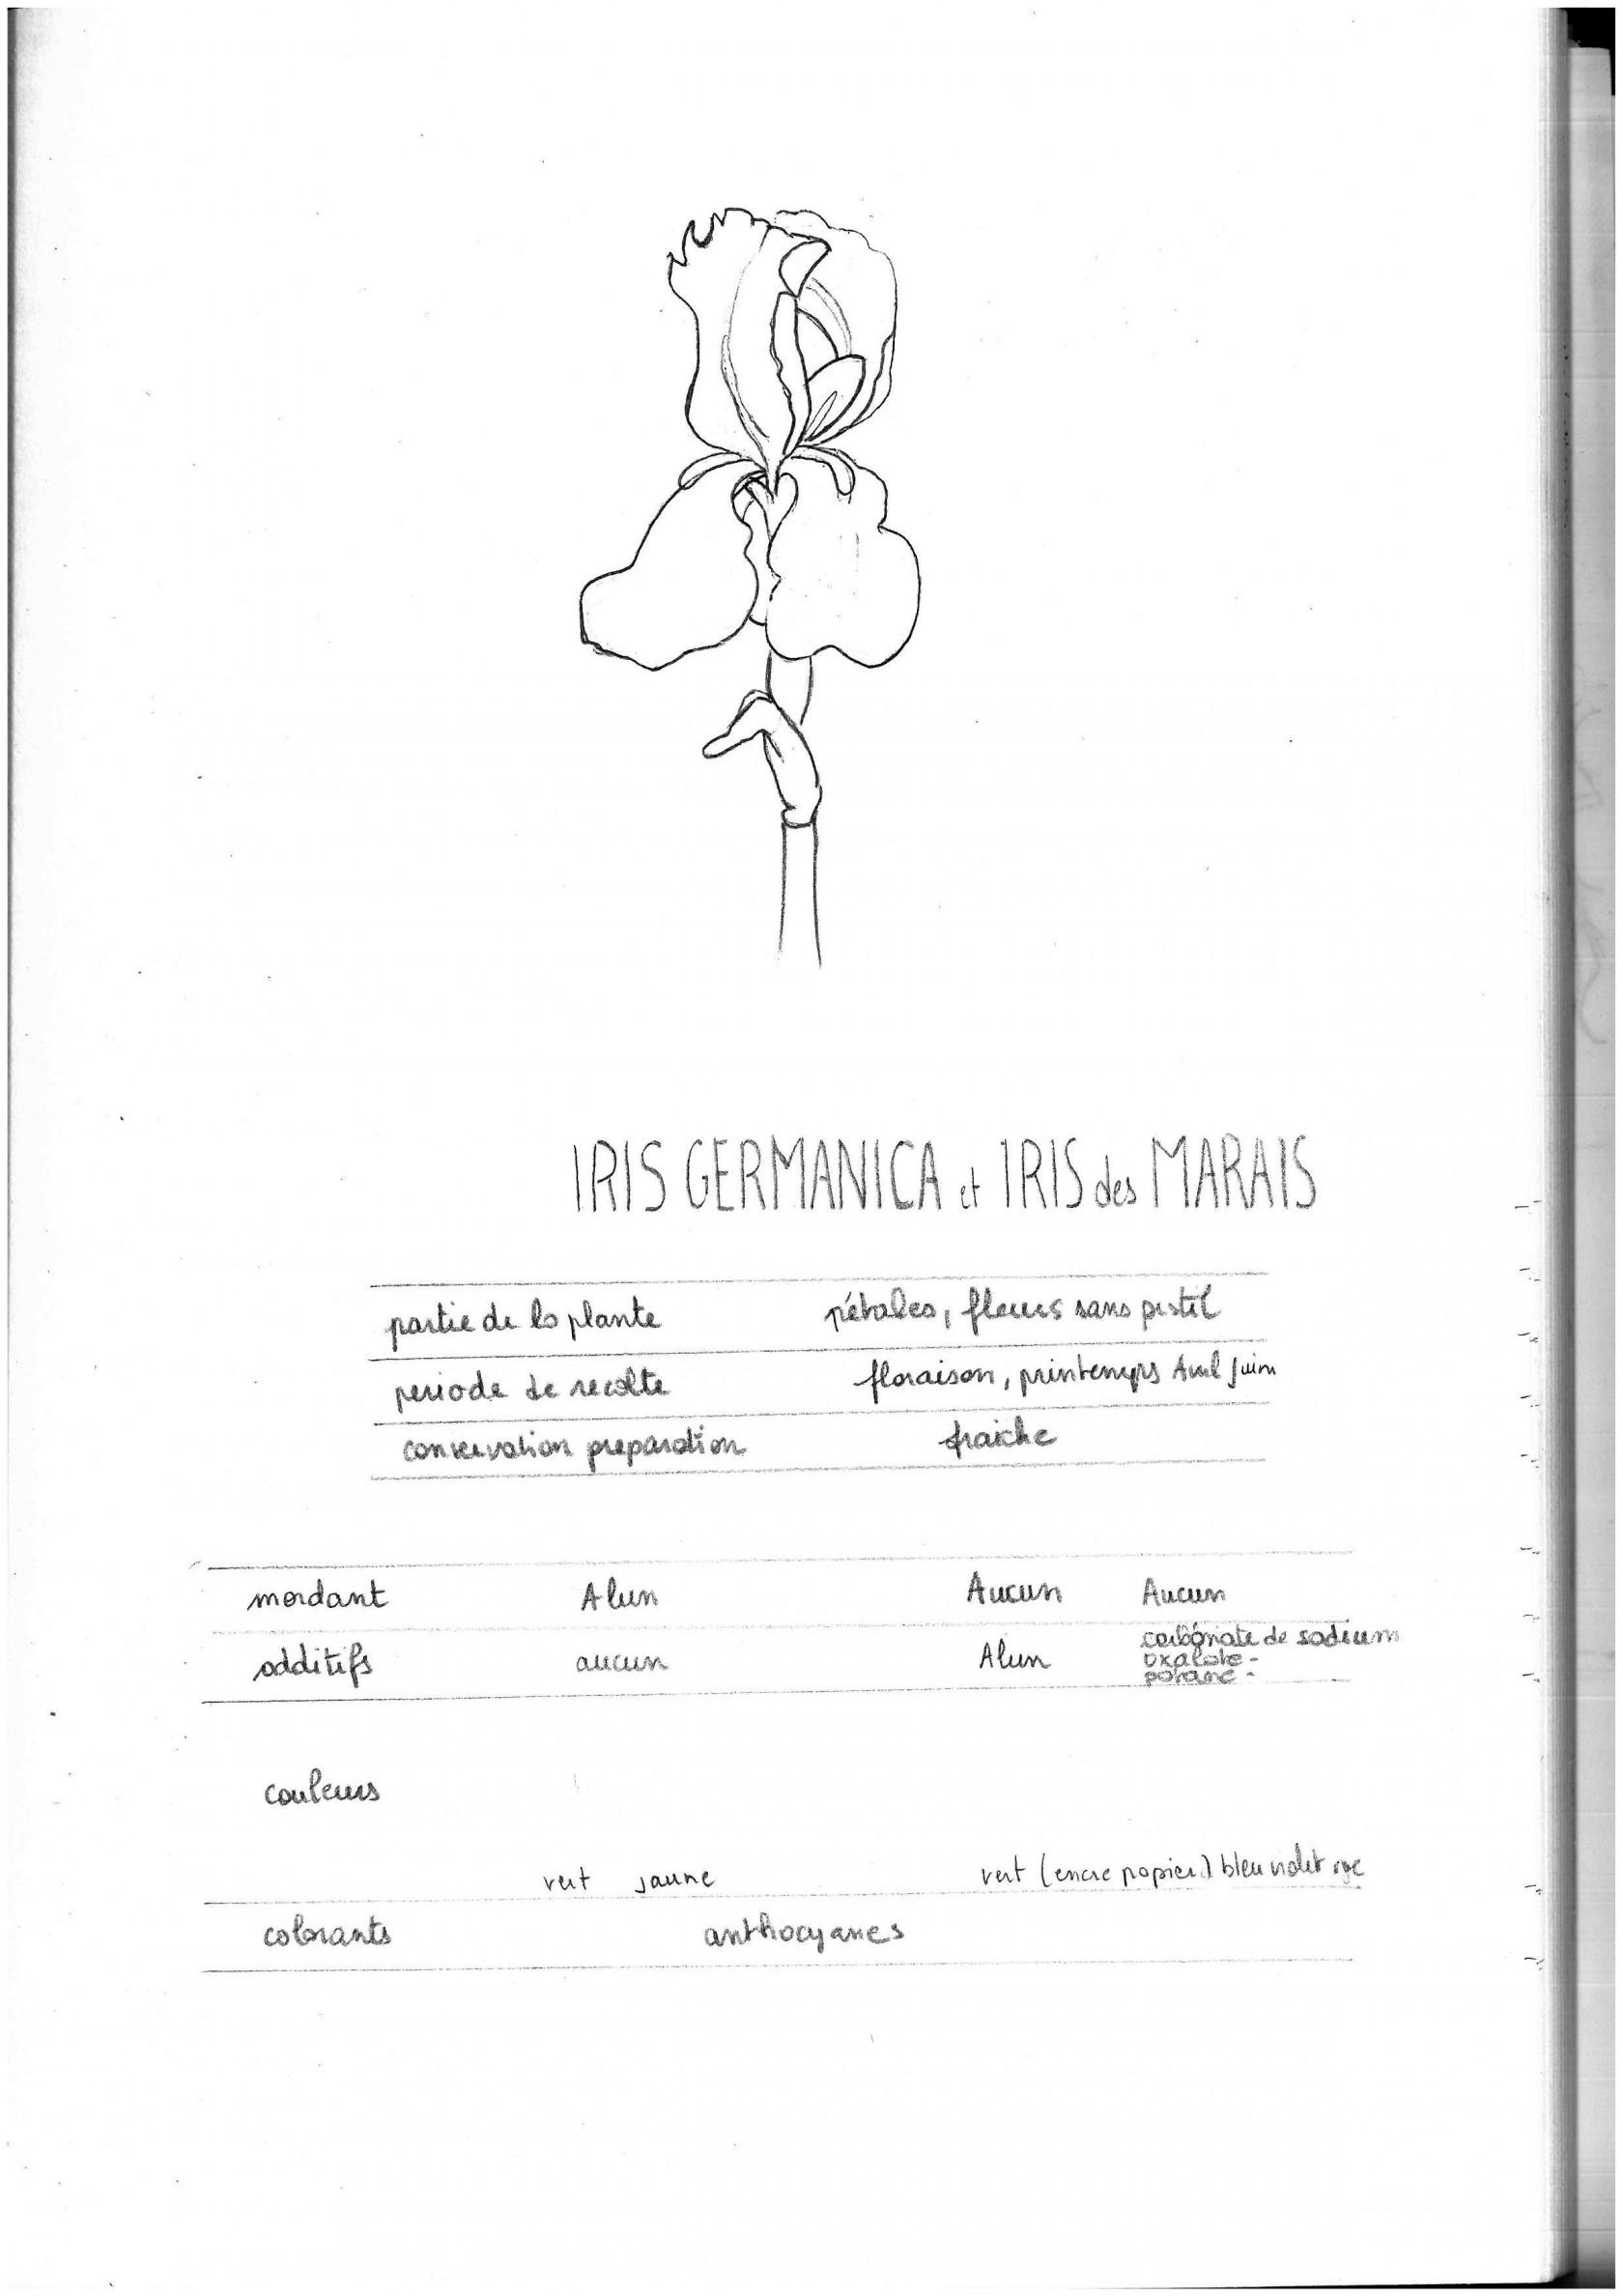 irisgermanicap25.jpg